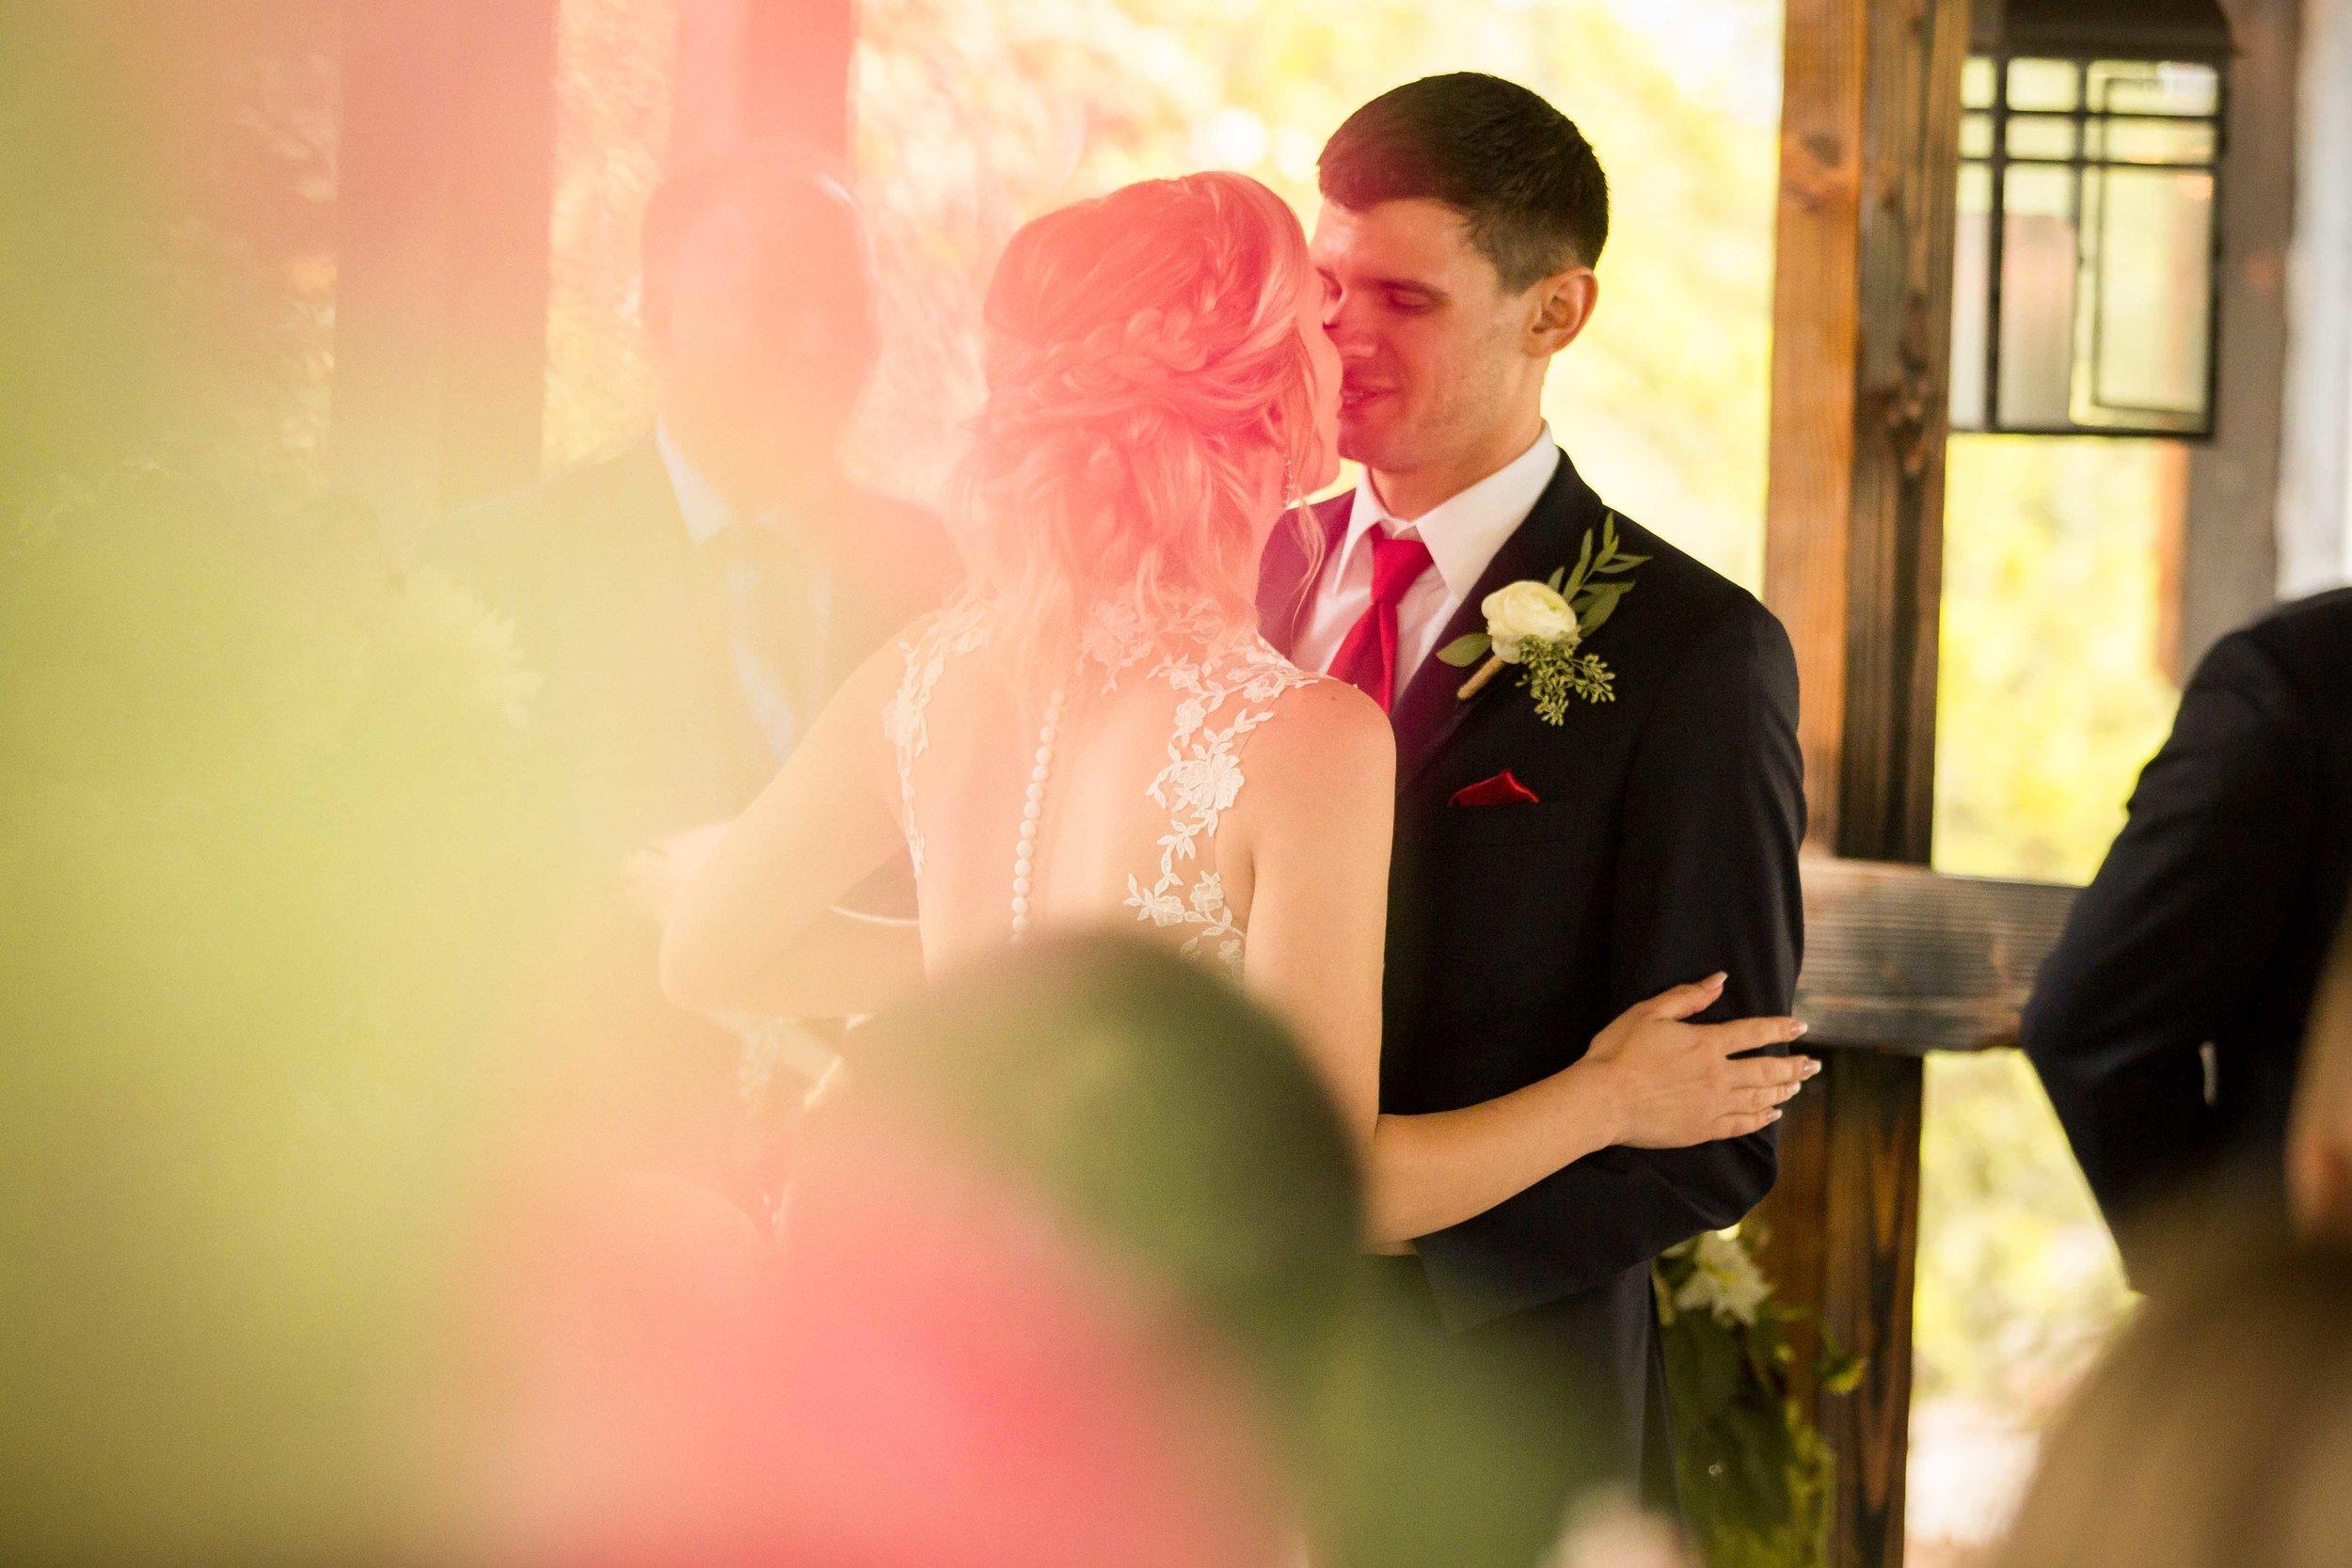 Ceremony Heather and Zac - DillonVibes Photography-1.jpg